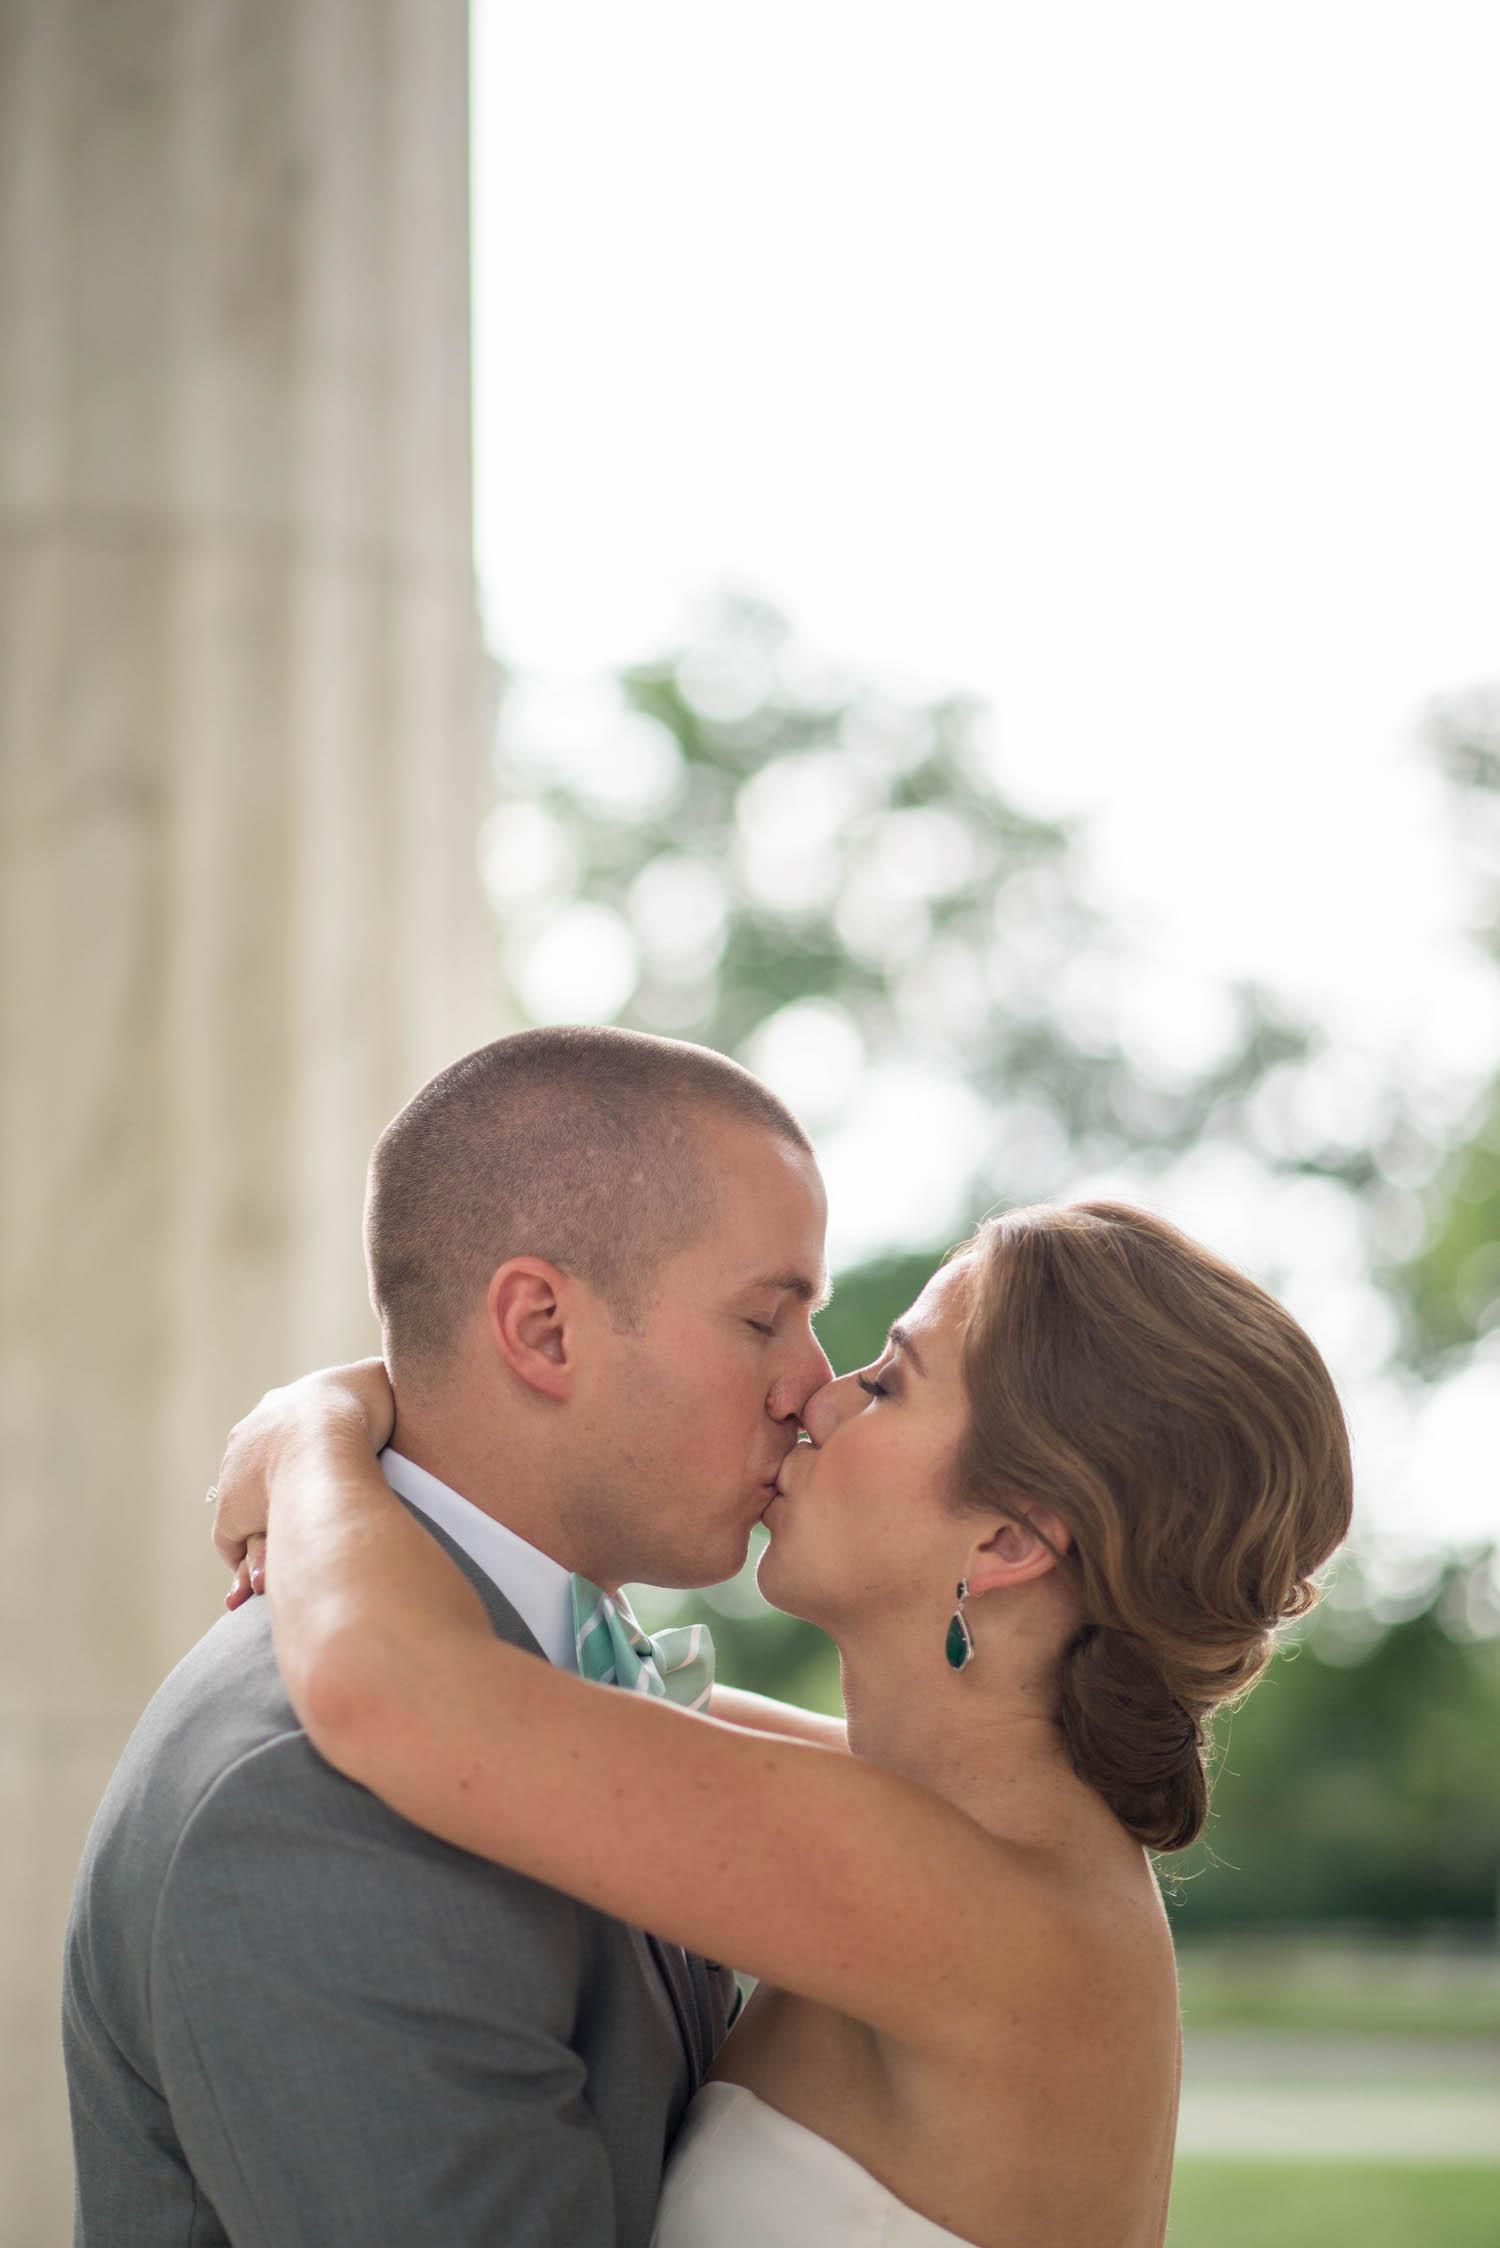 Washington DC Wedding - Sincerely Pete Events - Erin Tetterton Photography - Wedding Photos at the Monuments